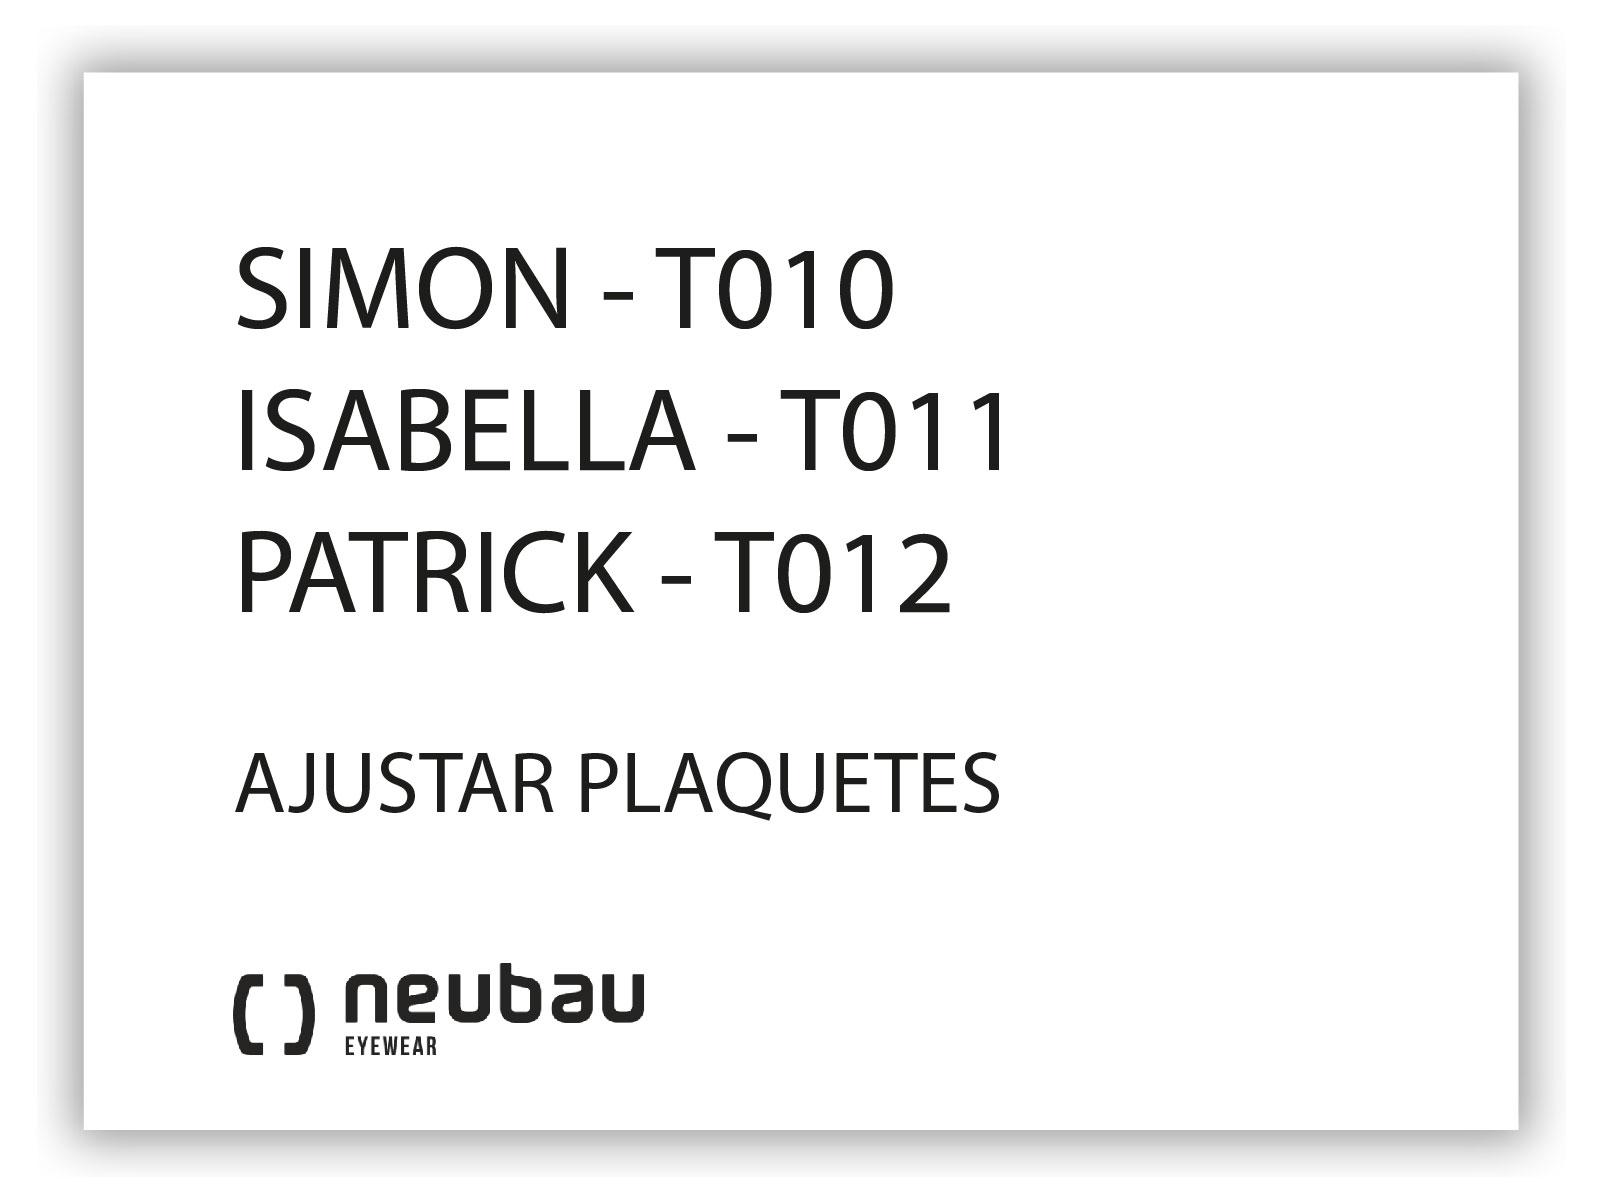 NEUBAU_T010, T011, T012-PLAQ